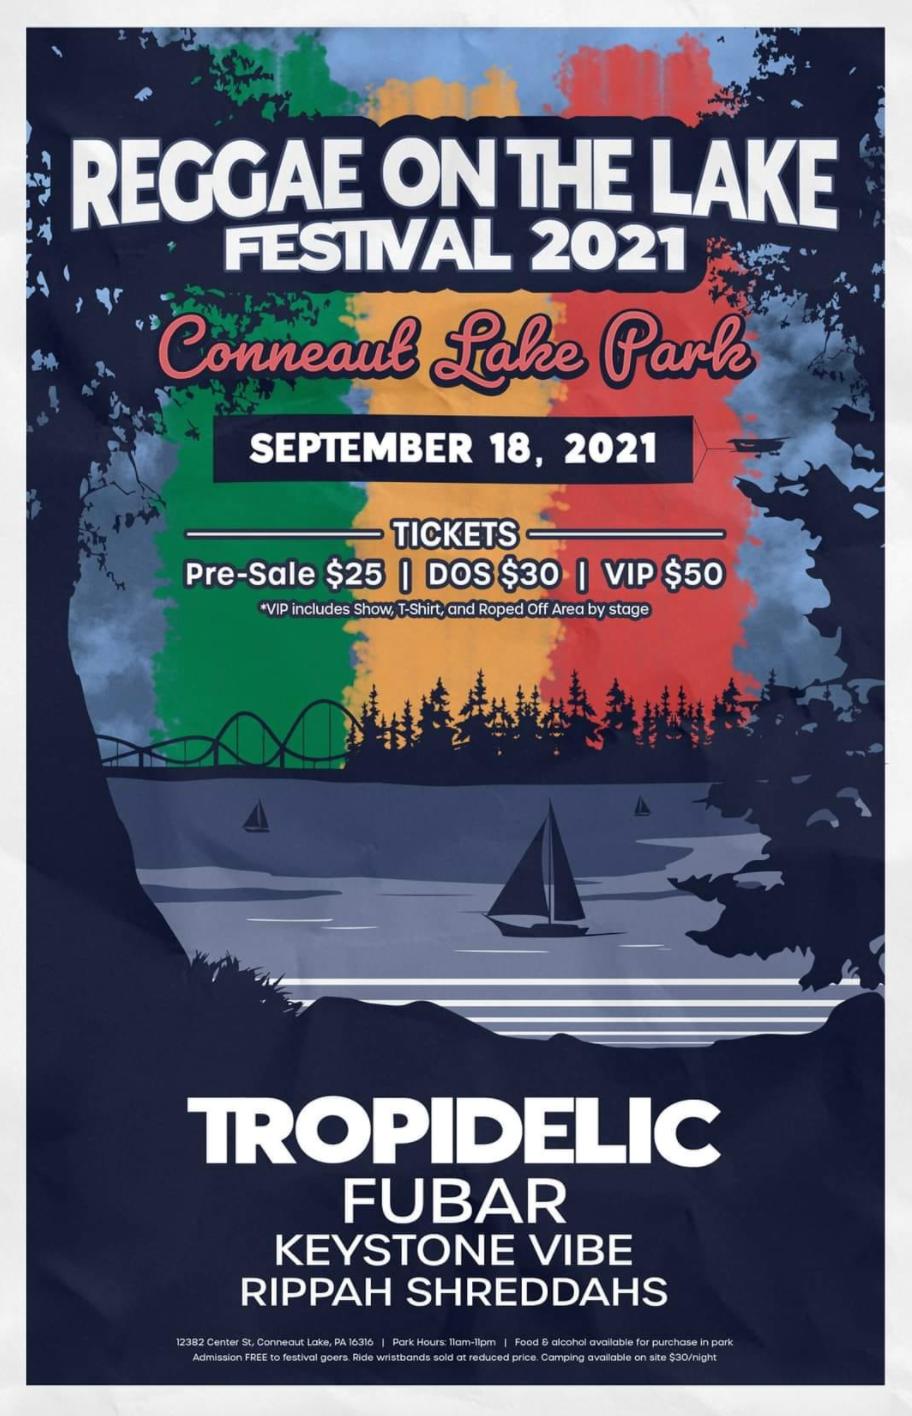 Reggae on the lake 2021 concert logo drawing of boat on lake